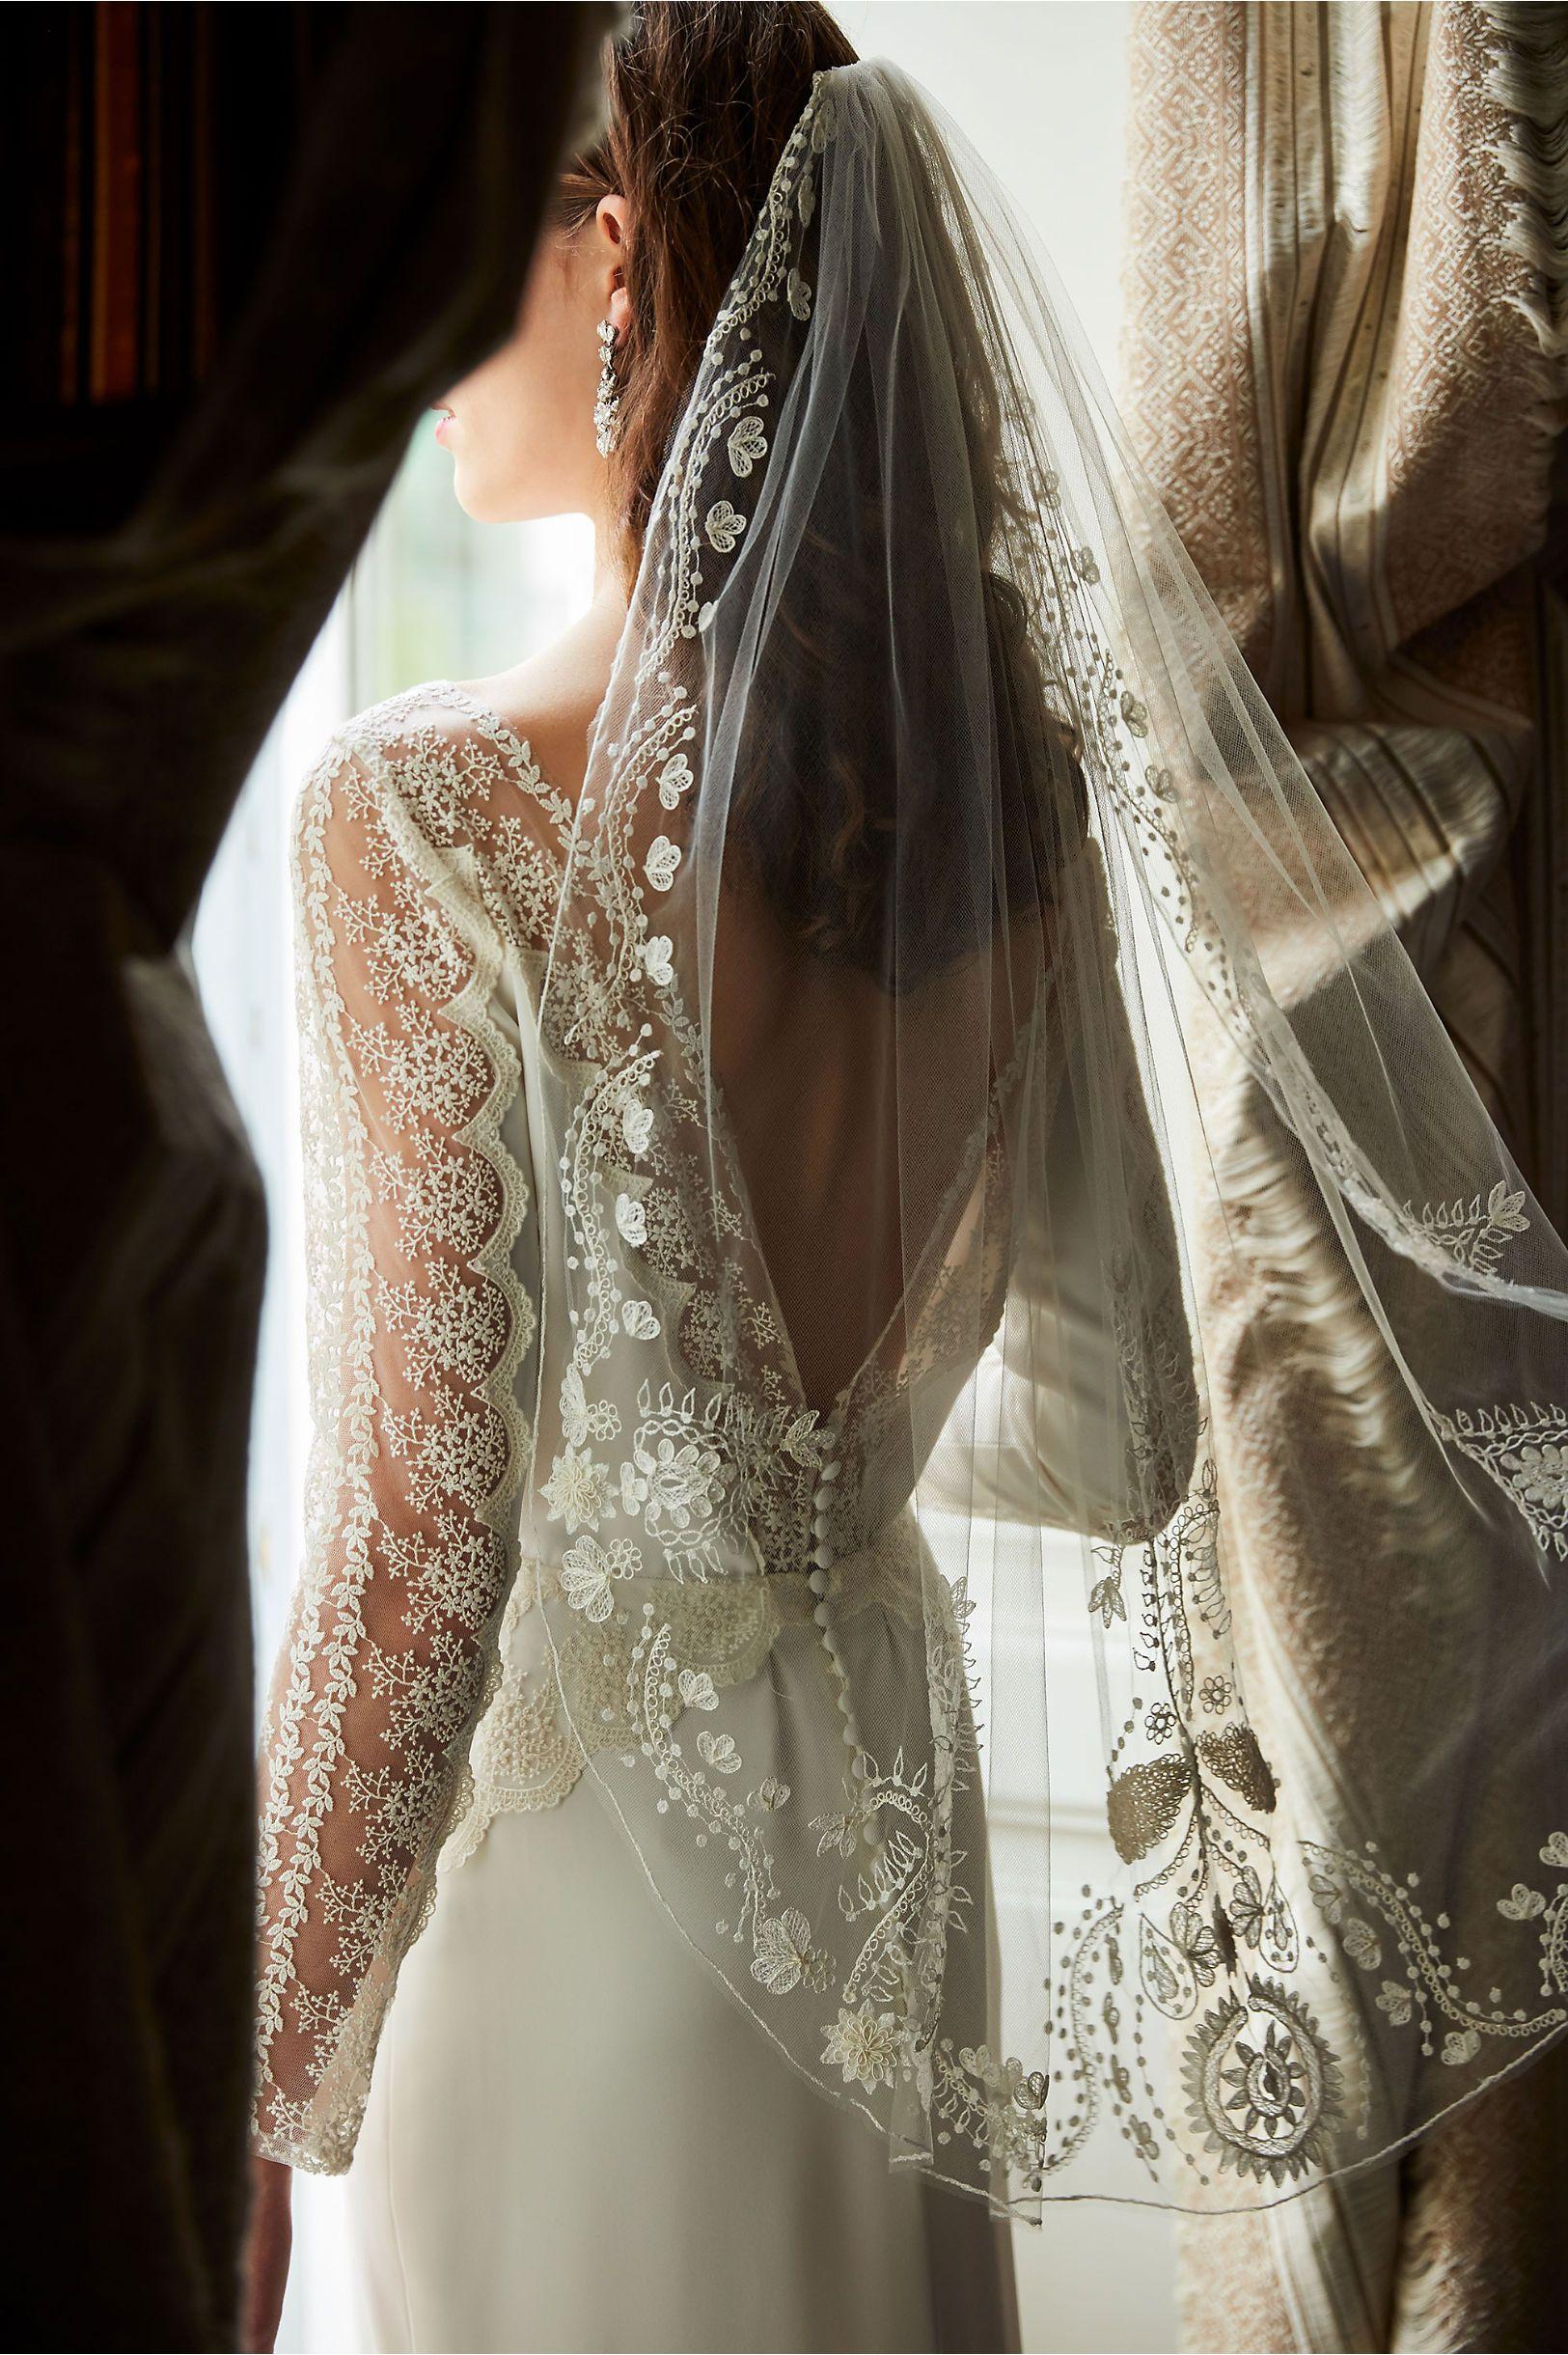 Bhldn ninette veil in bride veils u headpieces bhldn veils